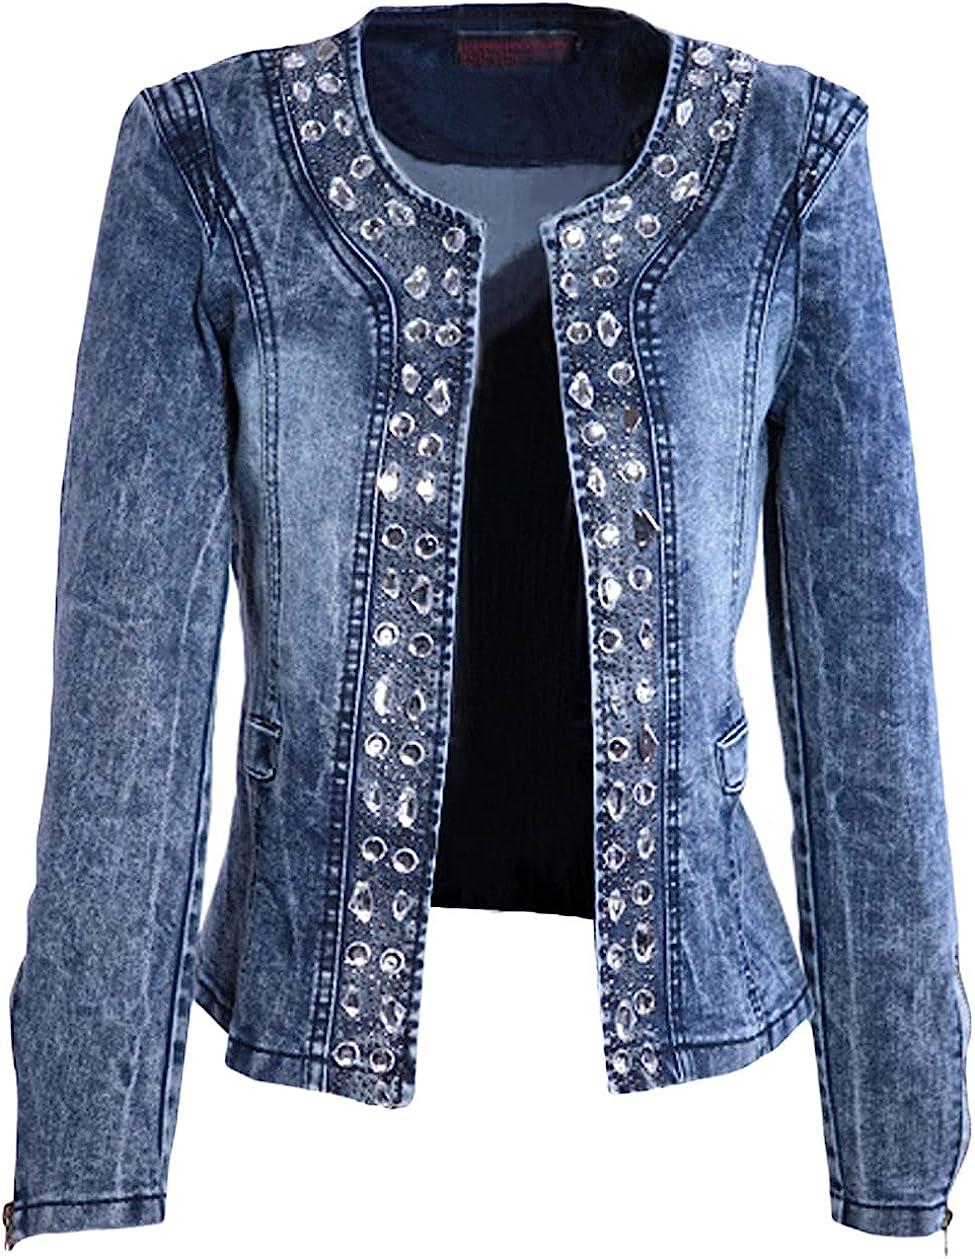 CHARTOU Women's Retro Slim Fit Long Sleeve Collarless Rhinestone Denim Jacket